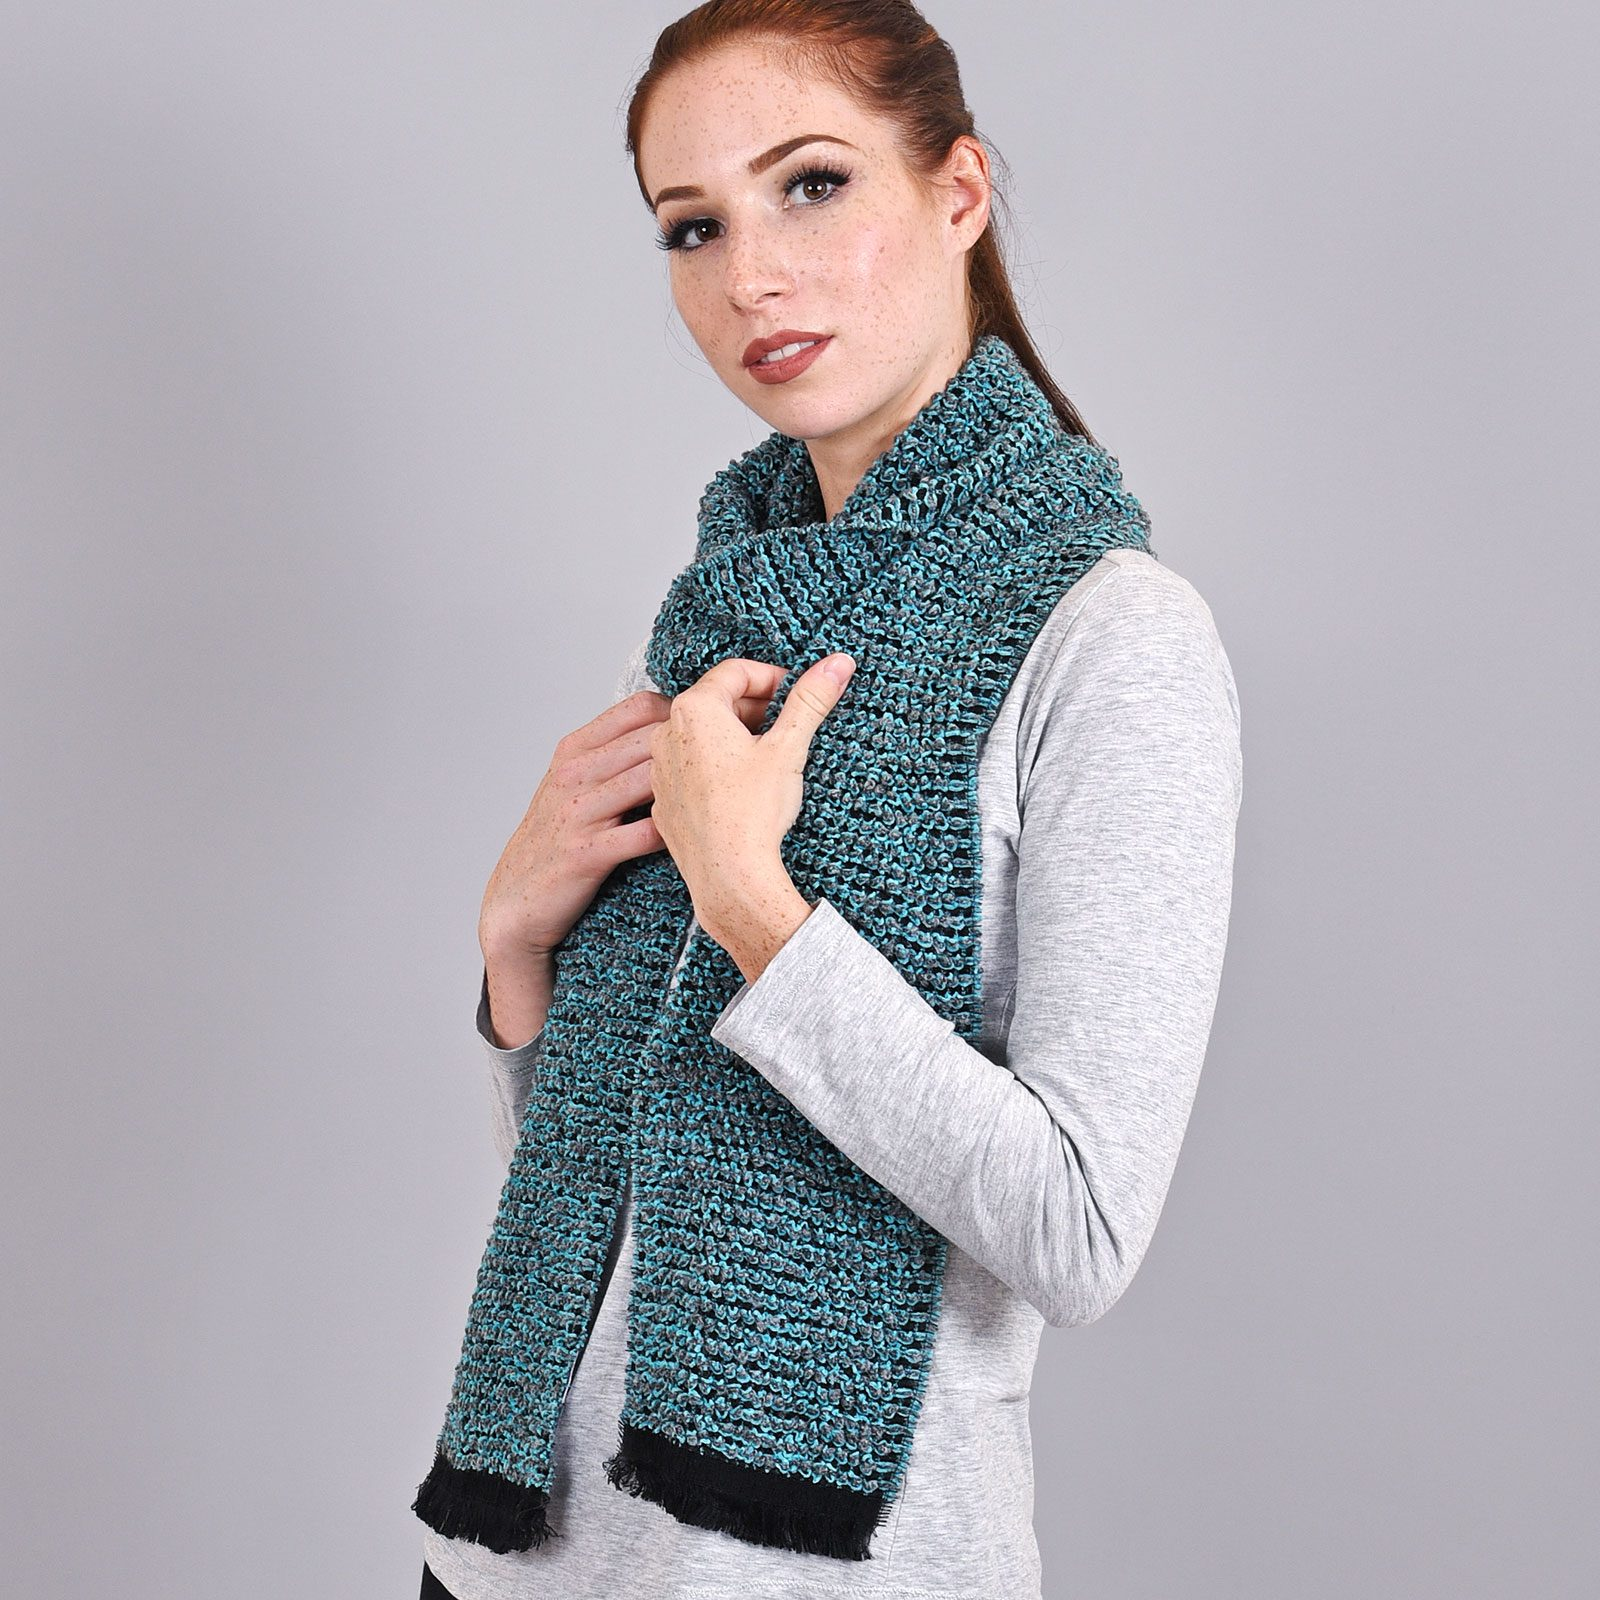 http://lookbook.allee-du-foulard.fr/wp-content/uploads/2019/01/AT-03479-VF16-echarpe-femme-fabrication-france-turquoise-1600x1600.jpg